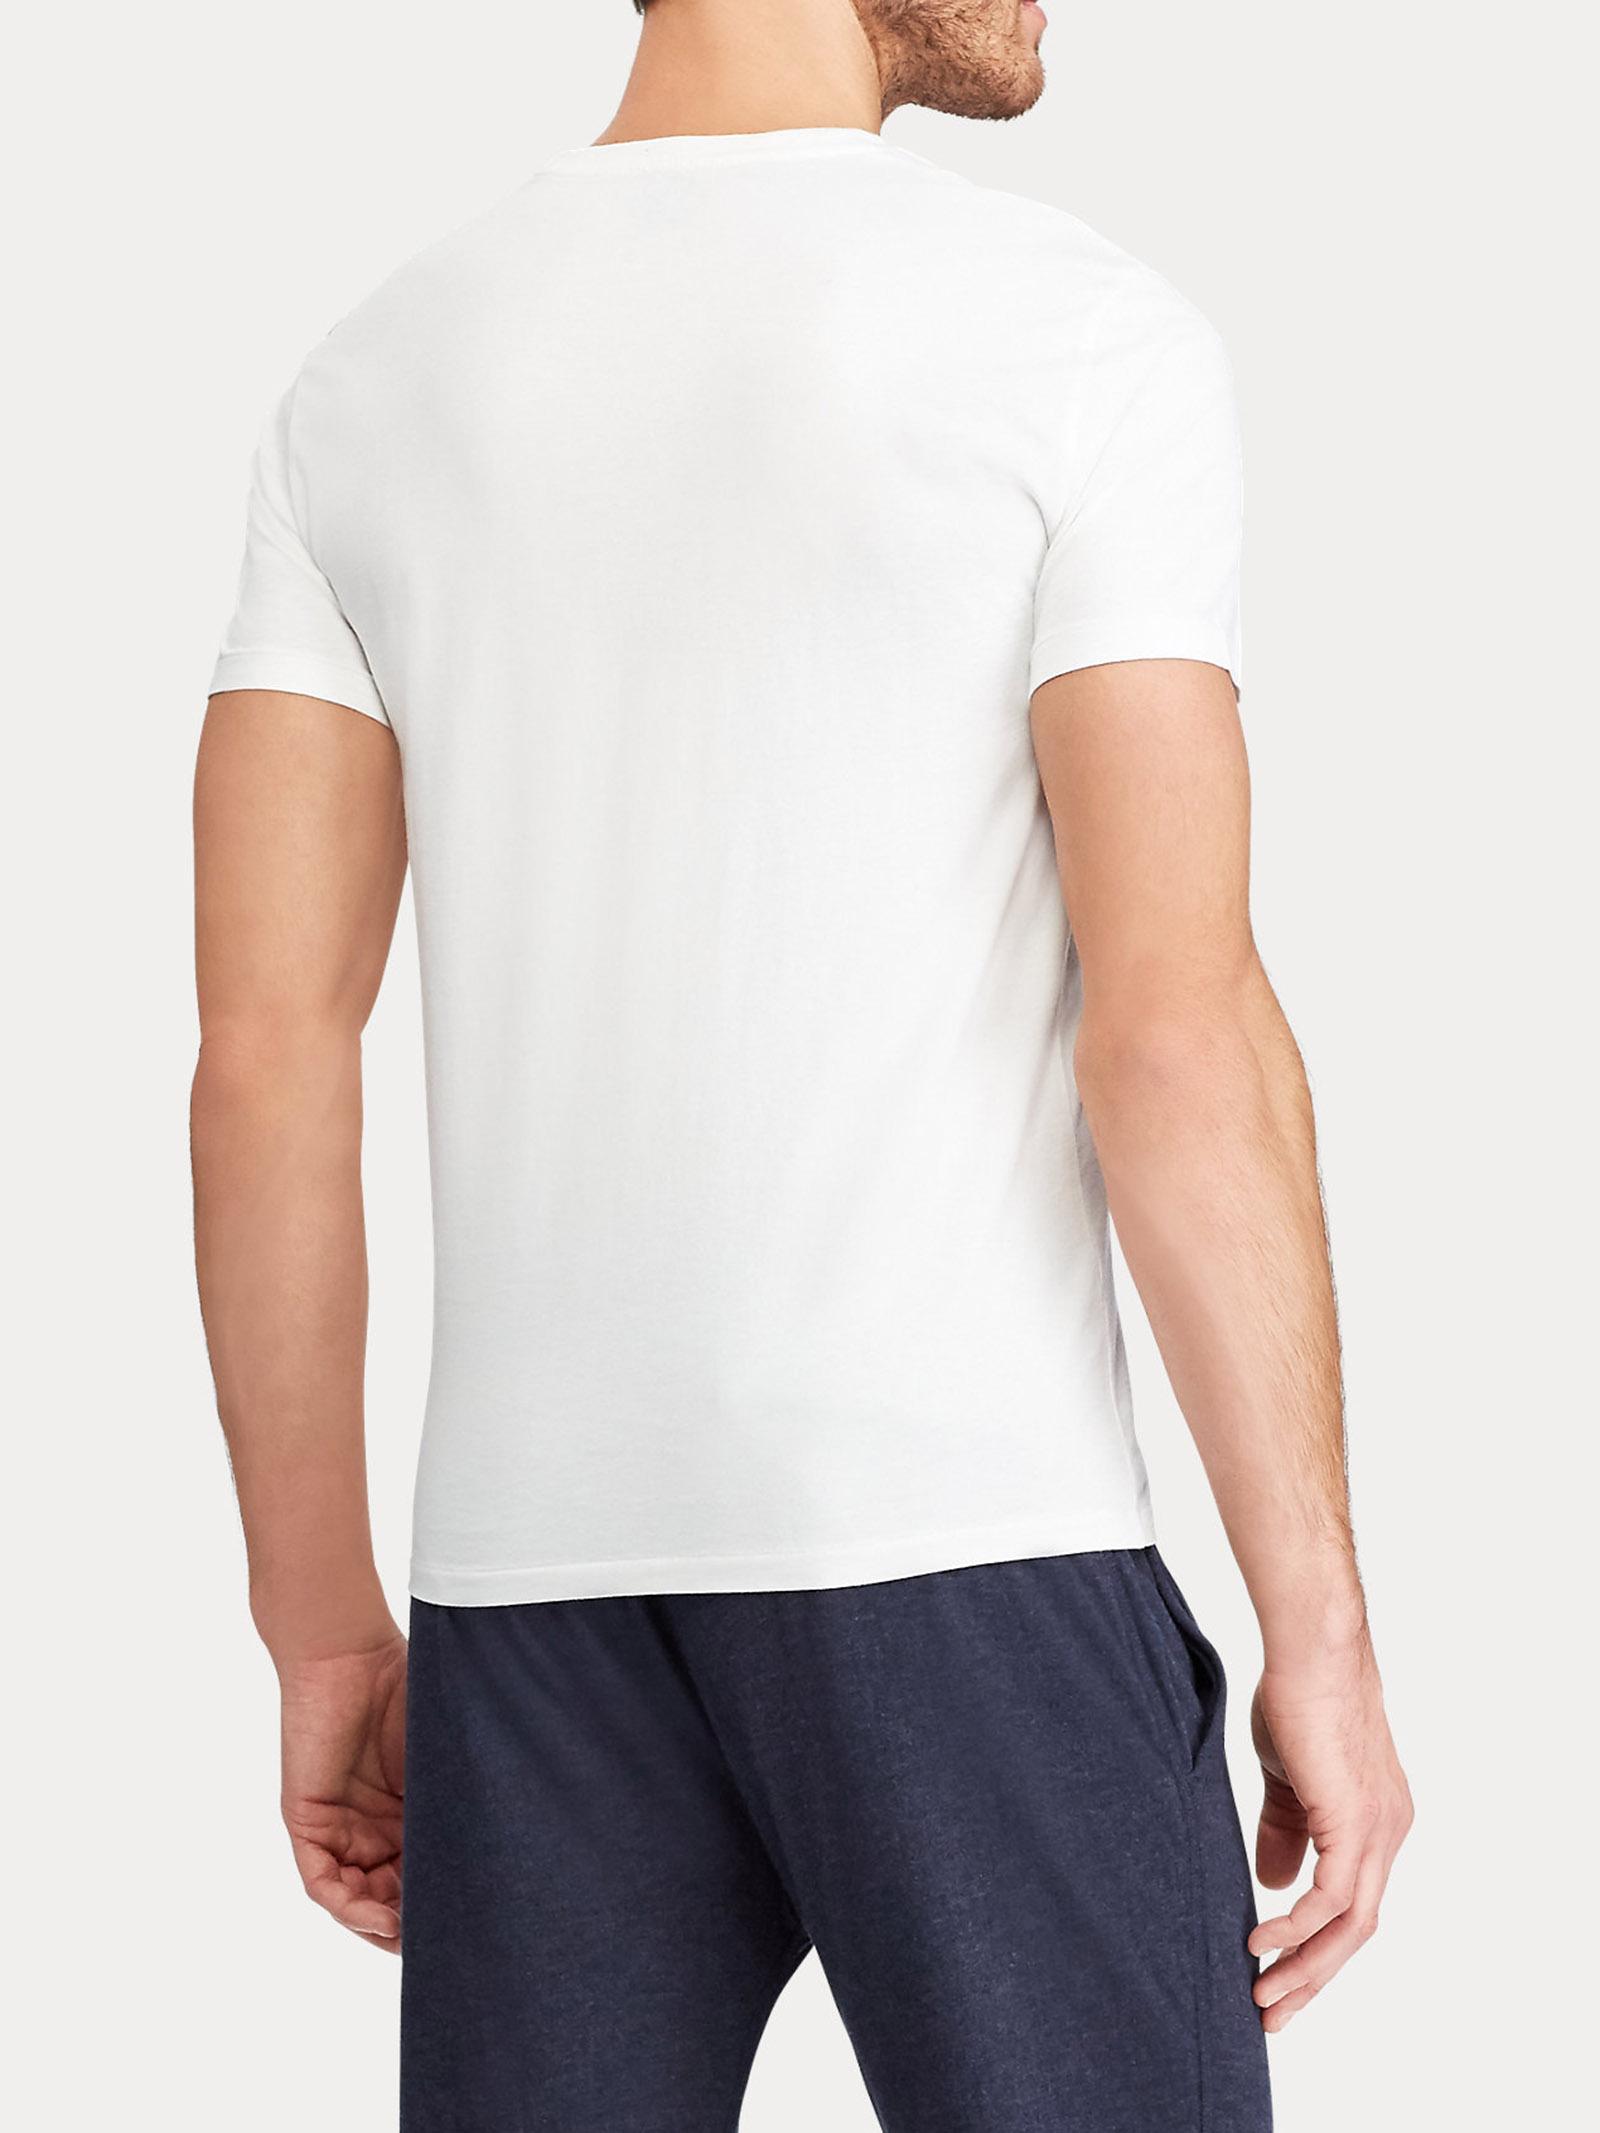 T-shirt girocollo slim fit RALPH LAUREN | T-shirt | 710-680785003